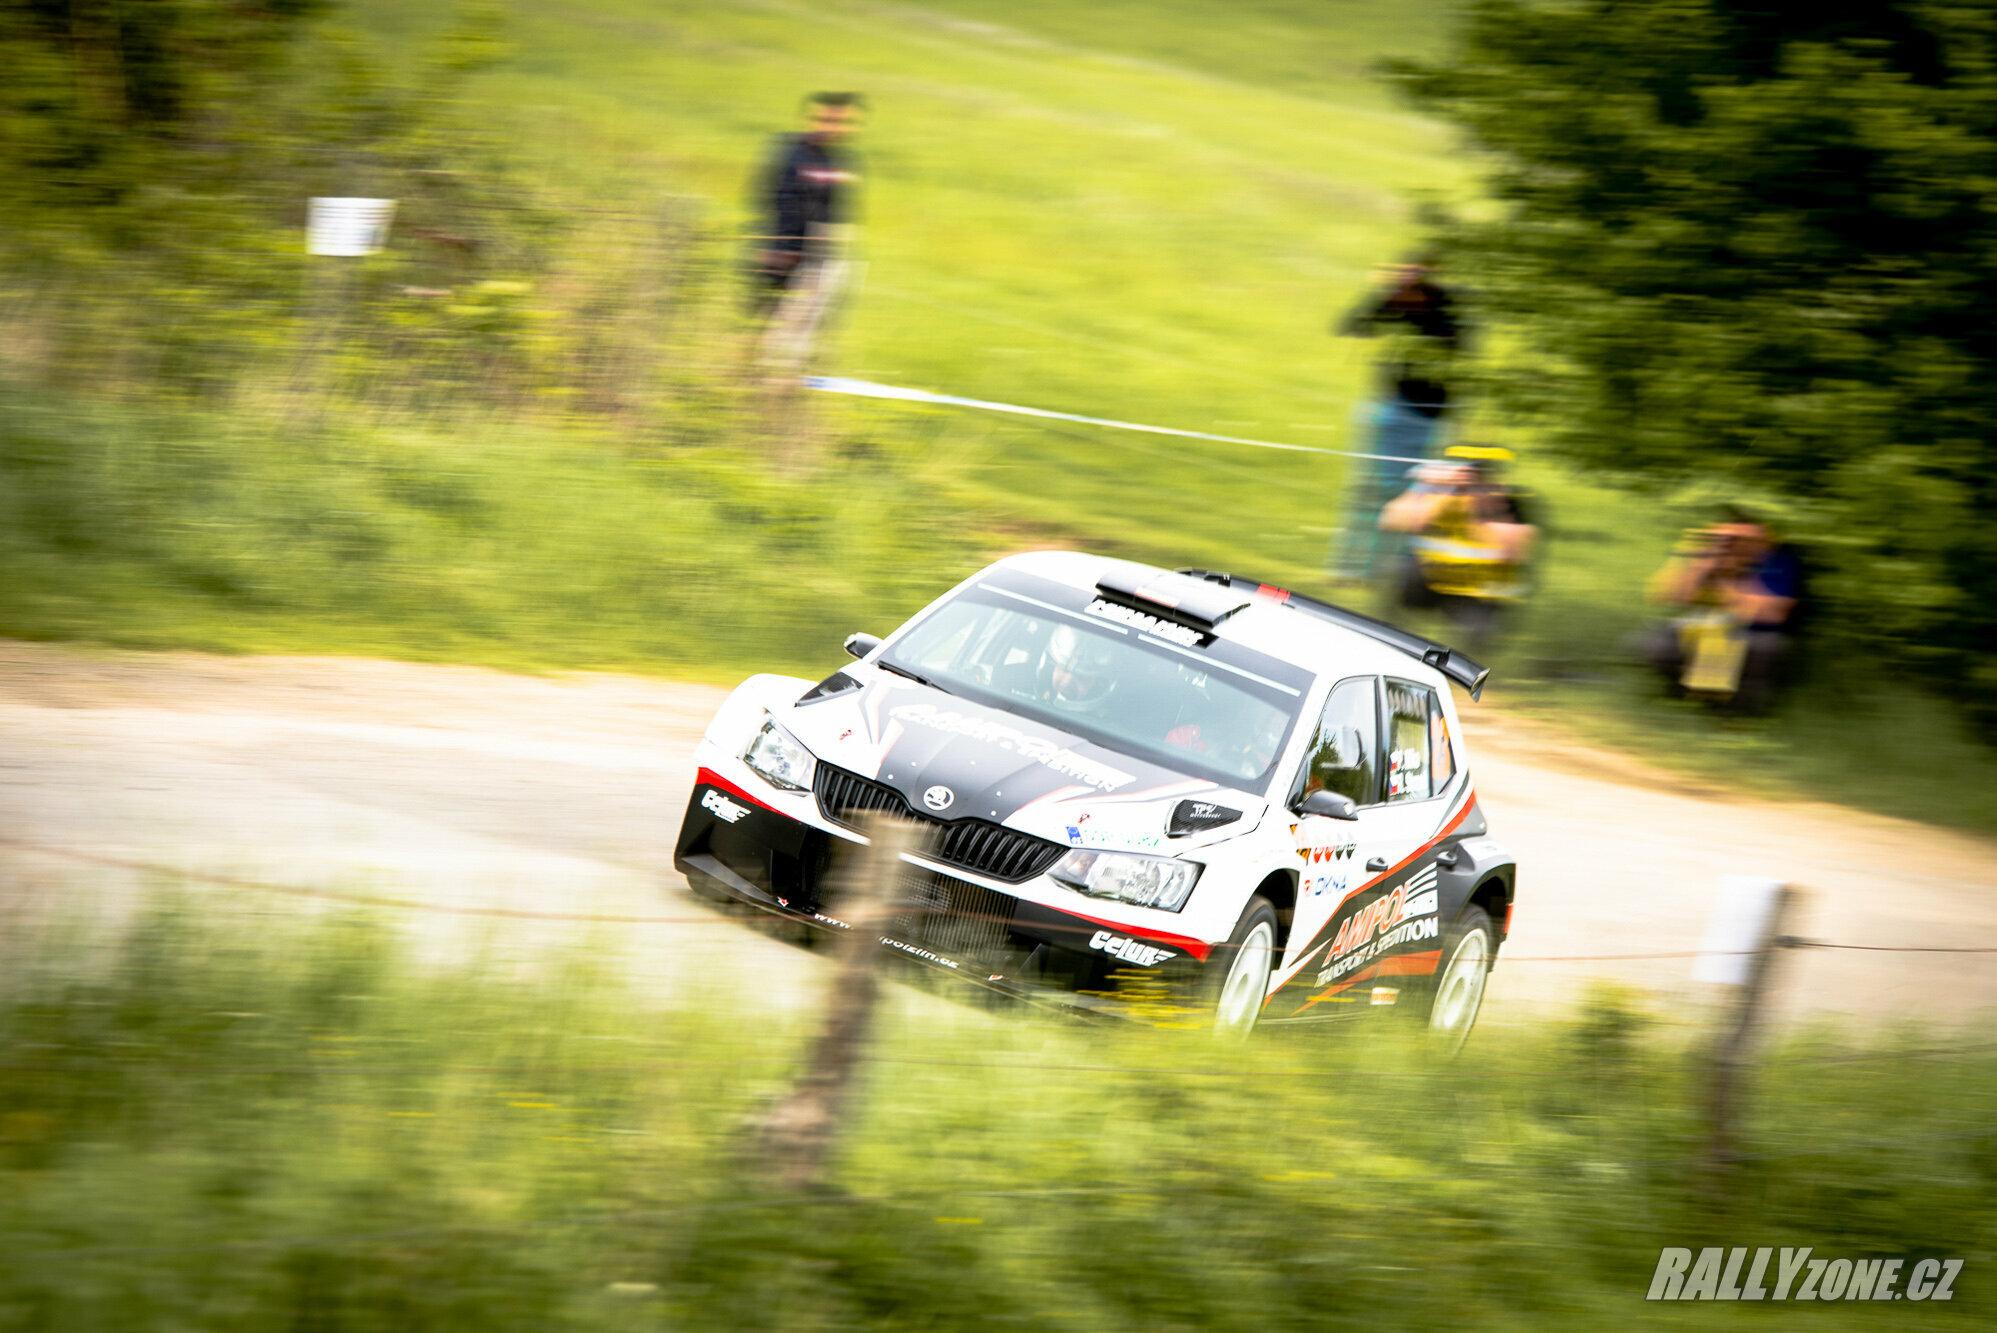 Minařík Racing